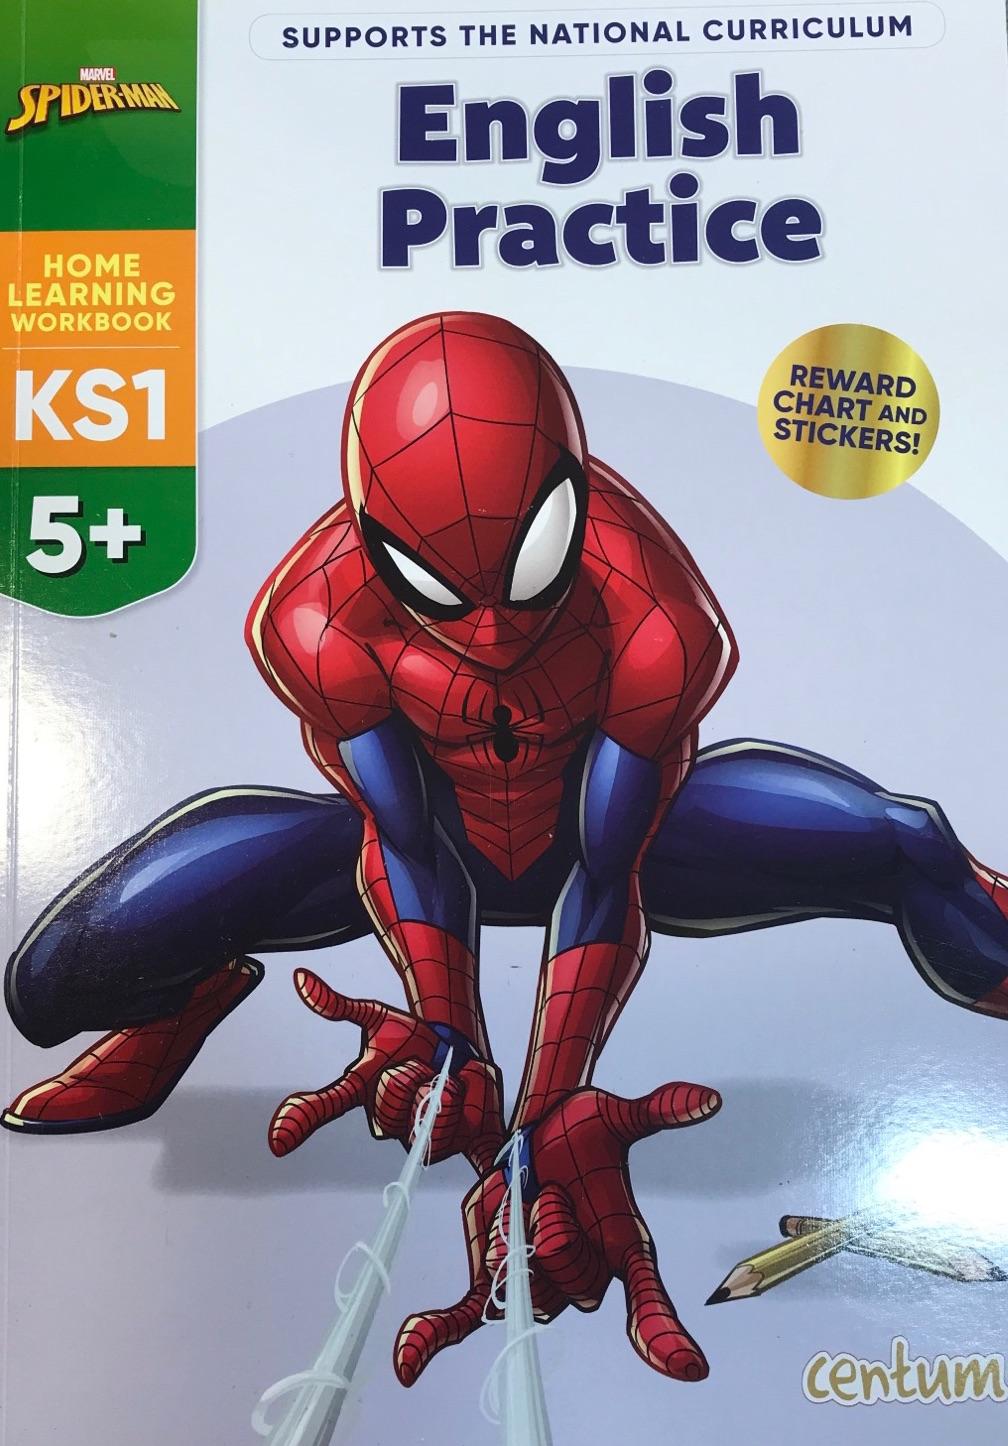 English Practice 5+ Spiderman